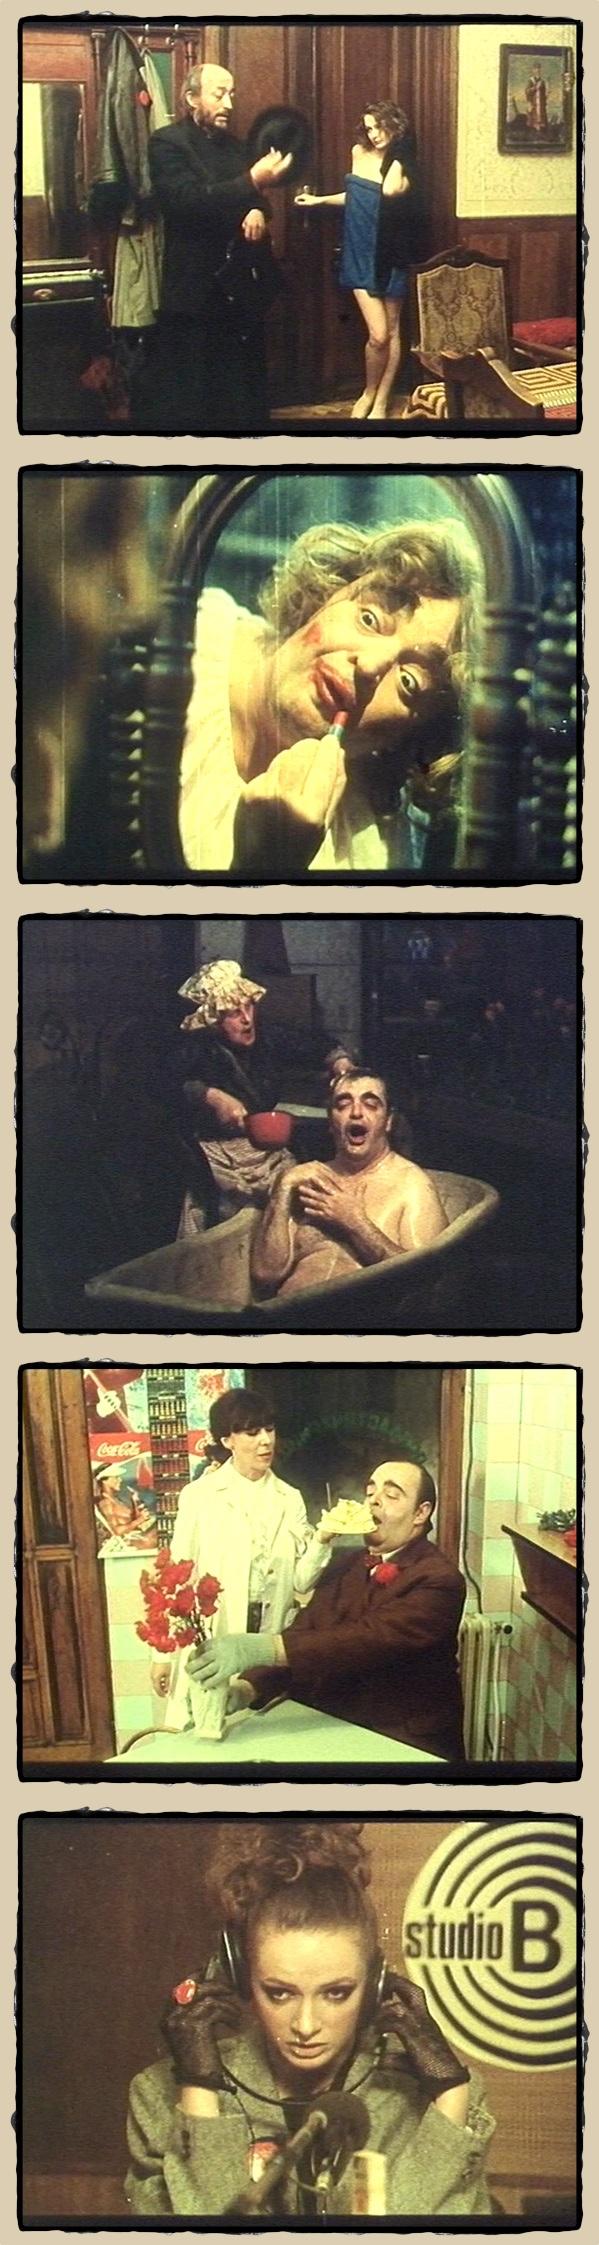 Davitelj protiv davitelja_(1984)